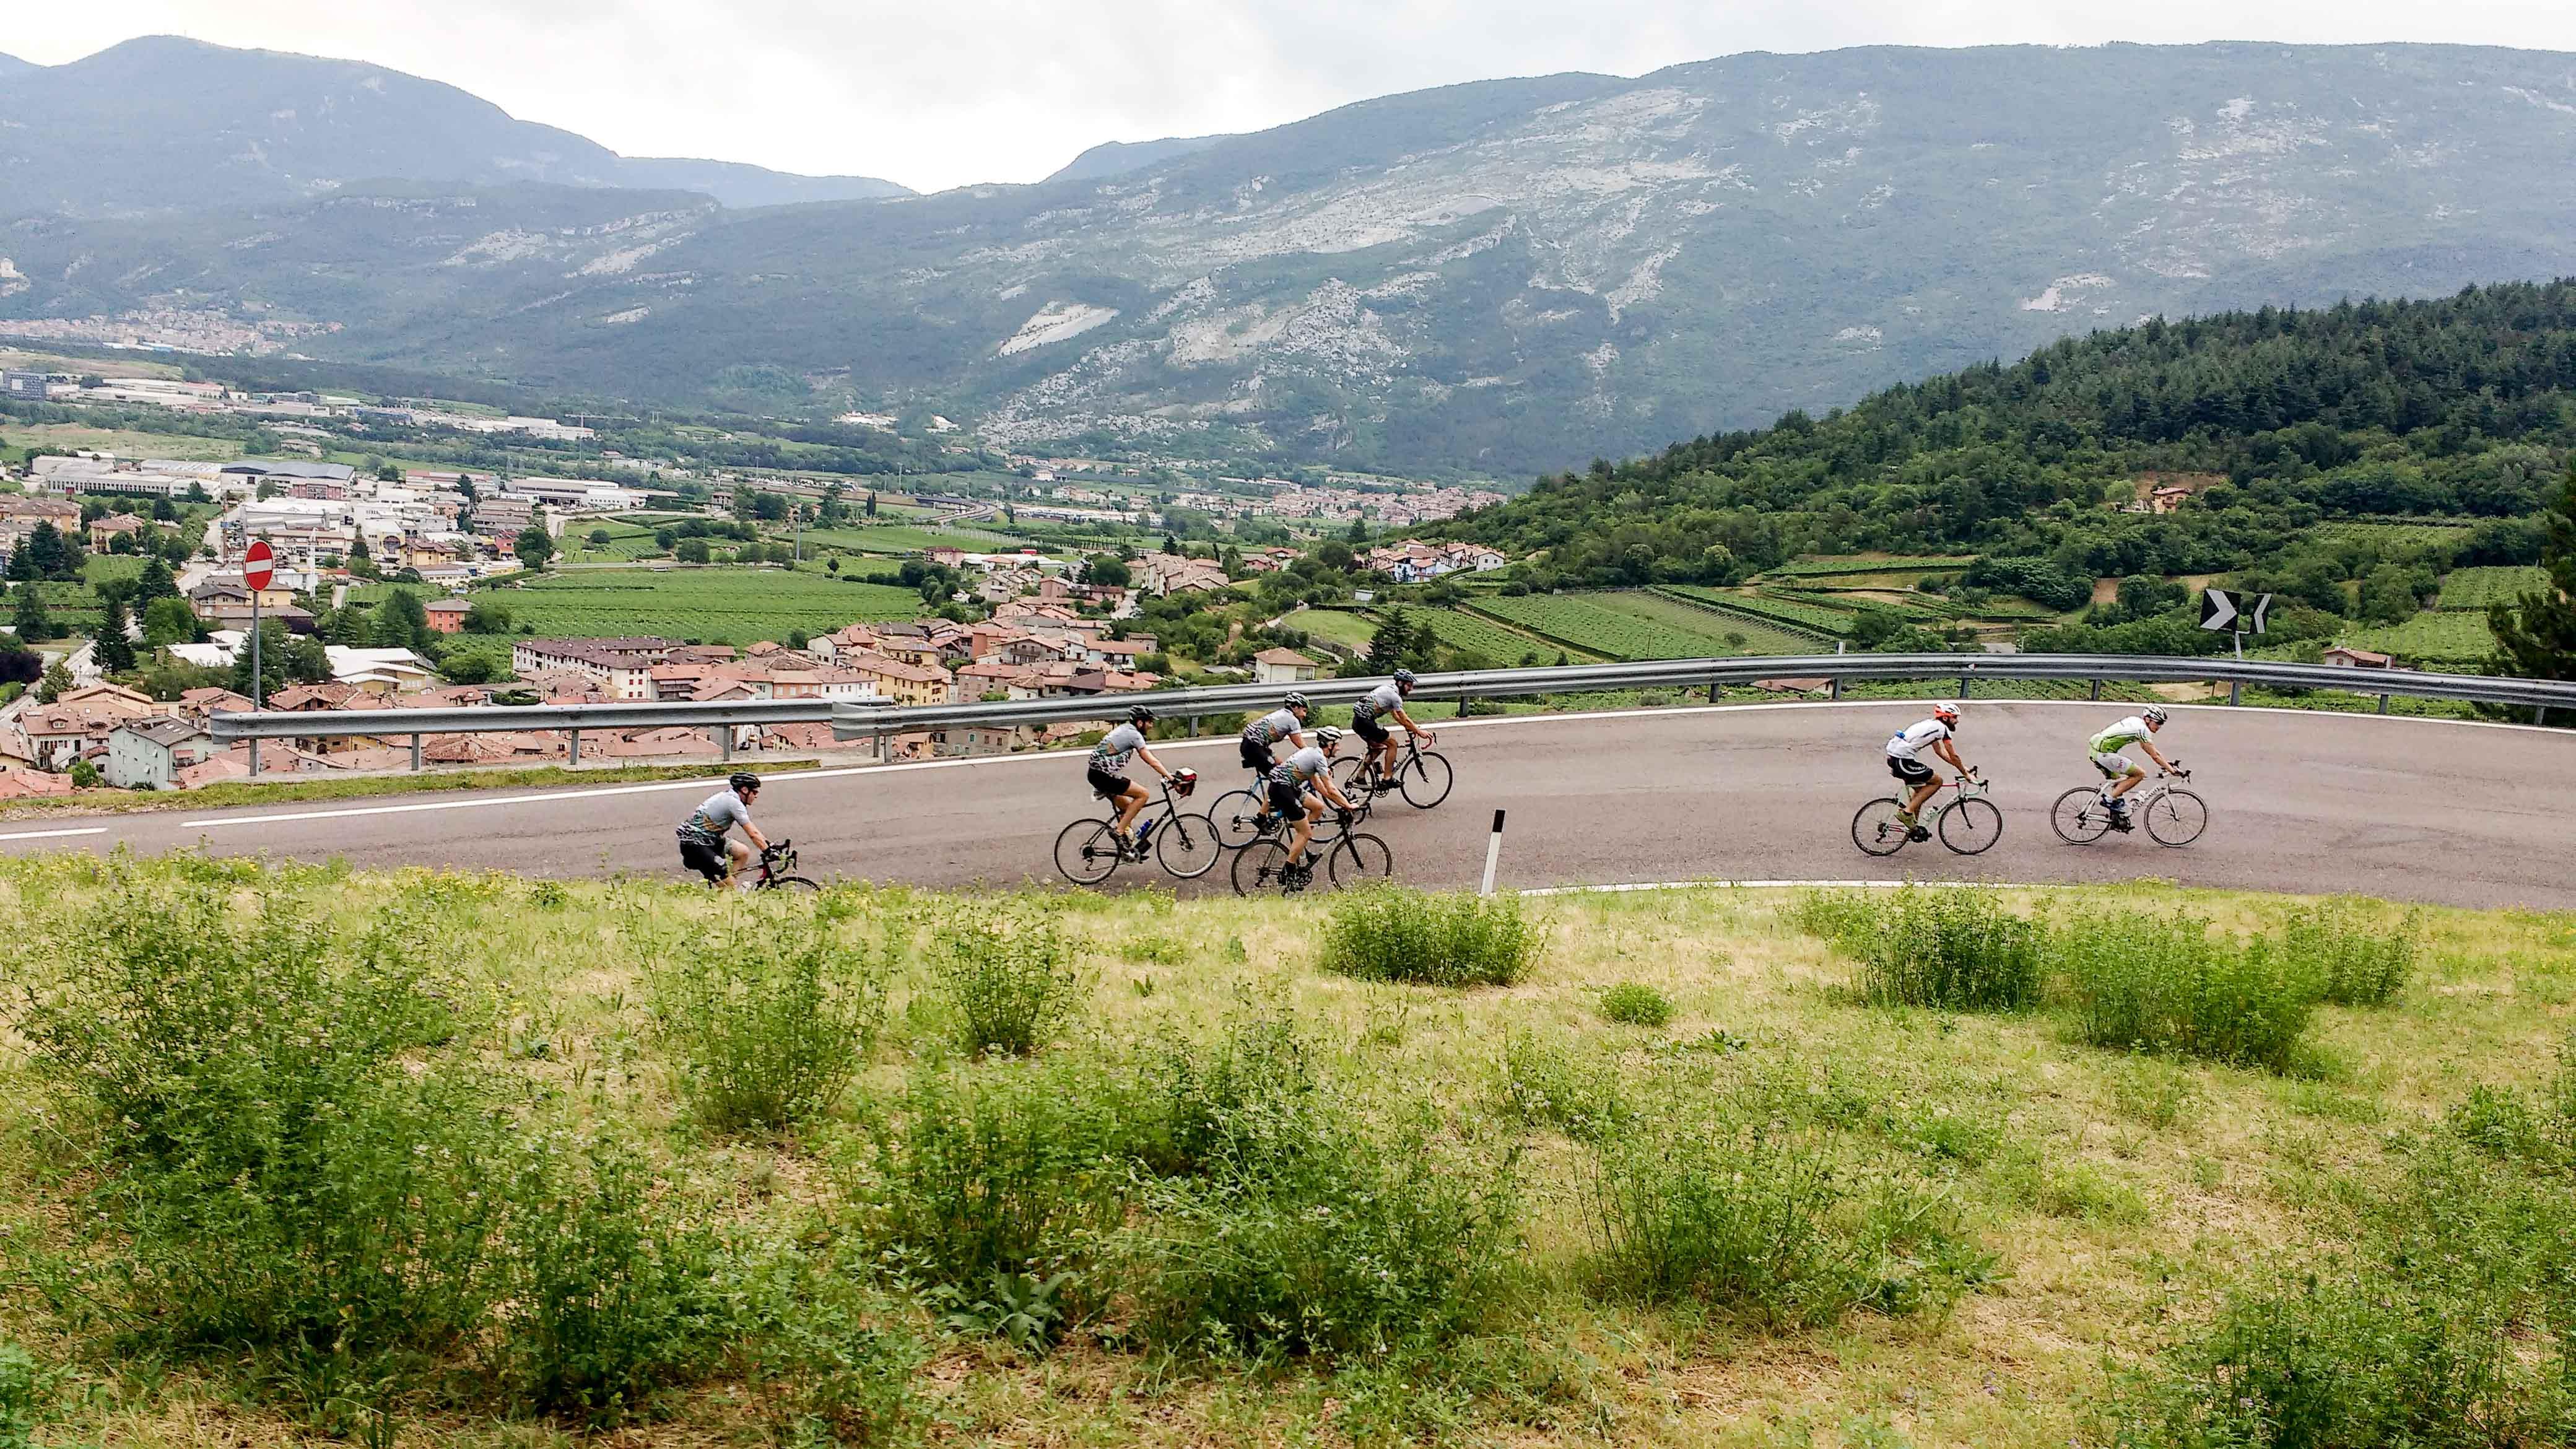 erman-bike-lazy-team-fassa-2017-lazyteam-modena-1